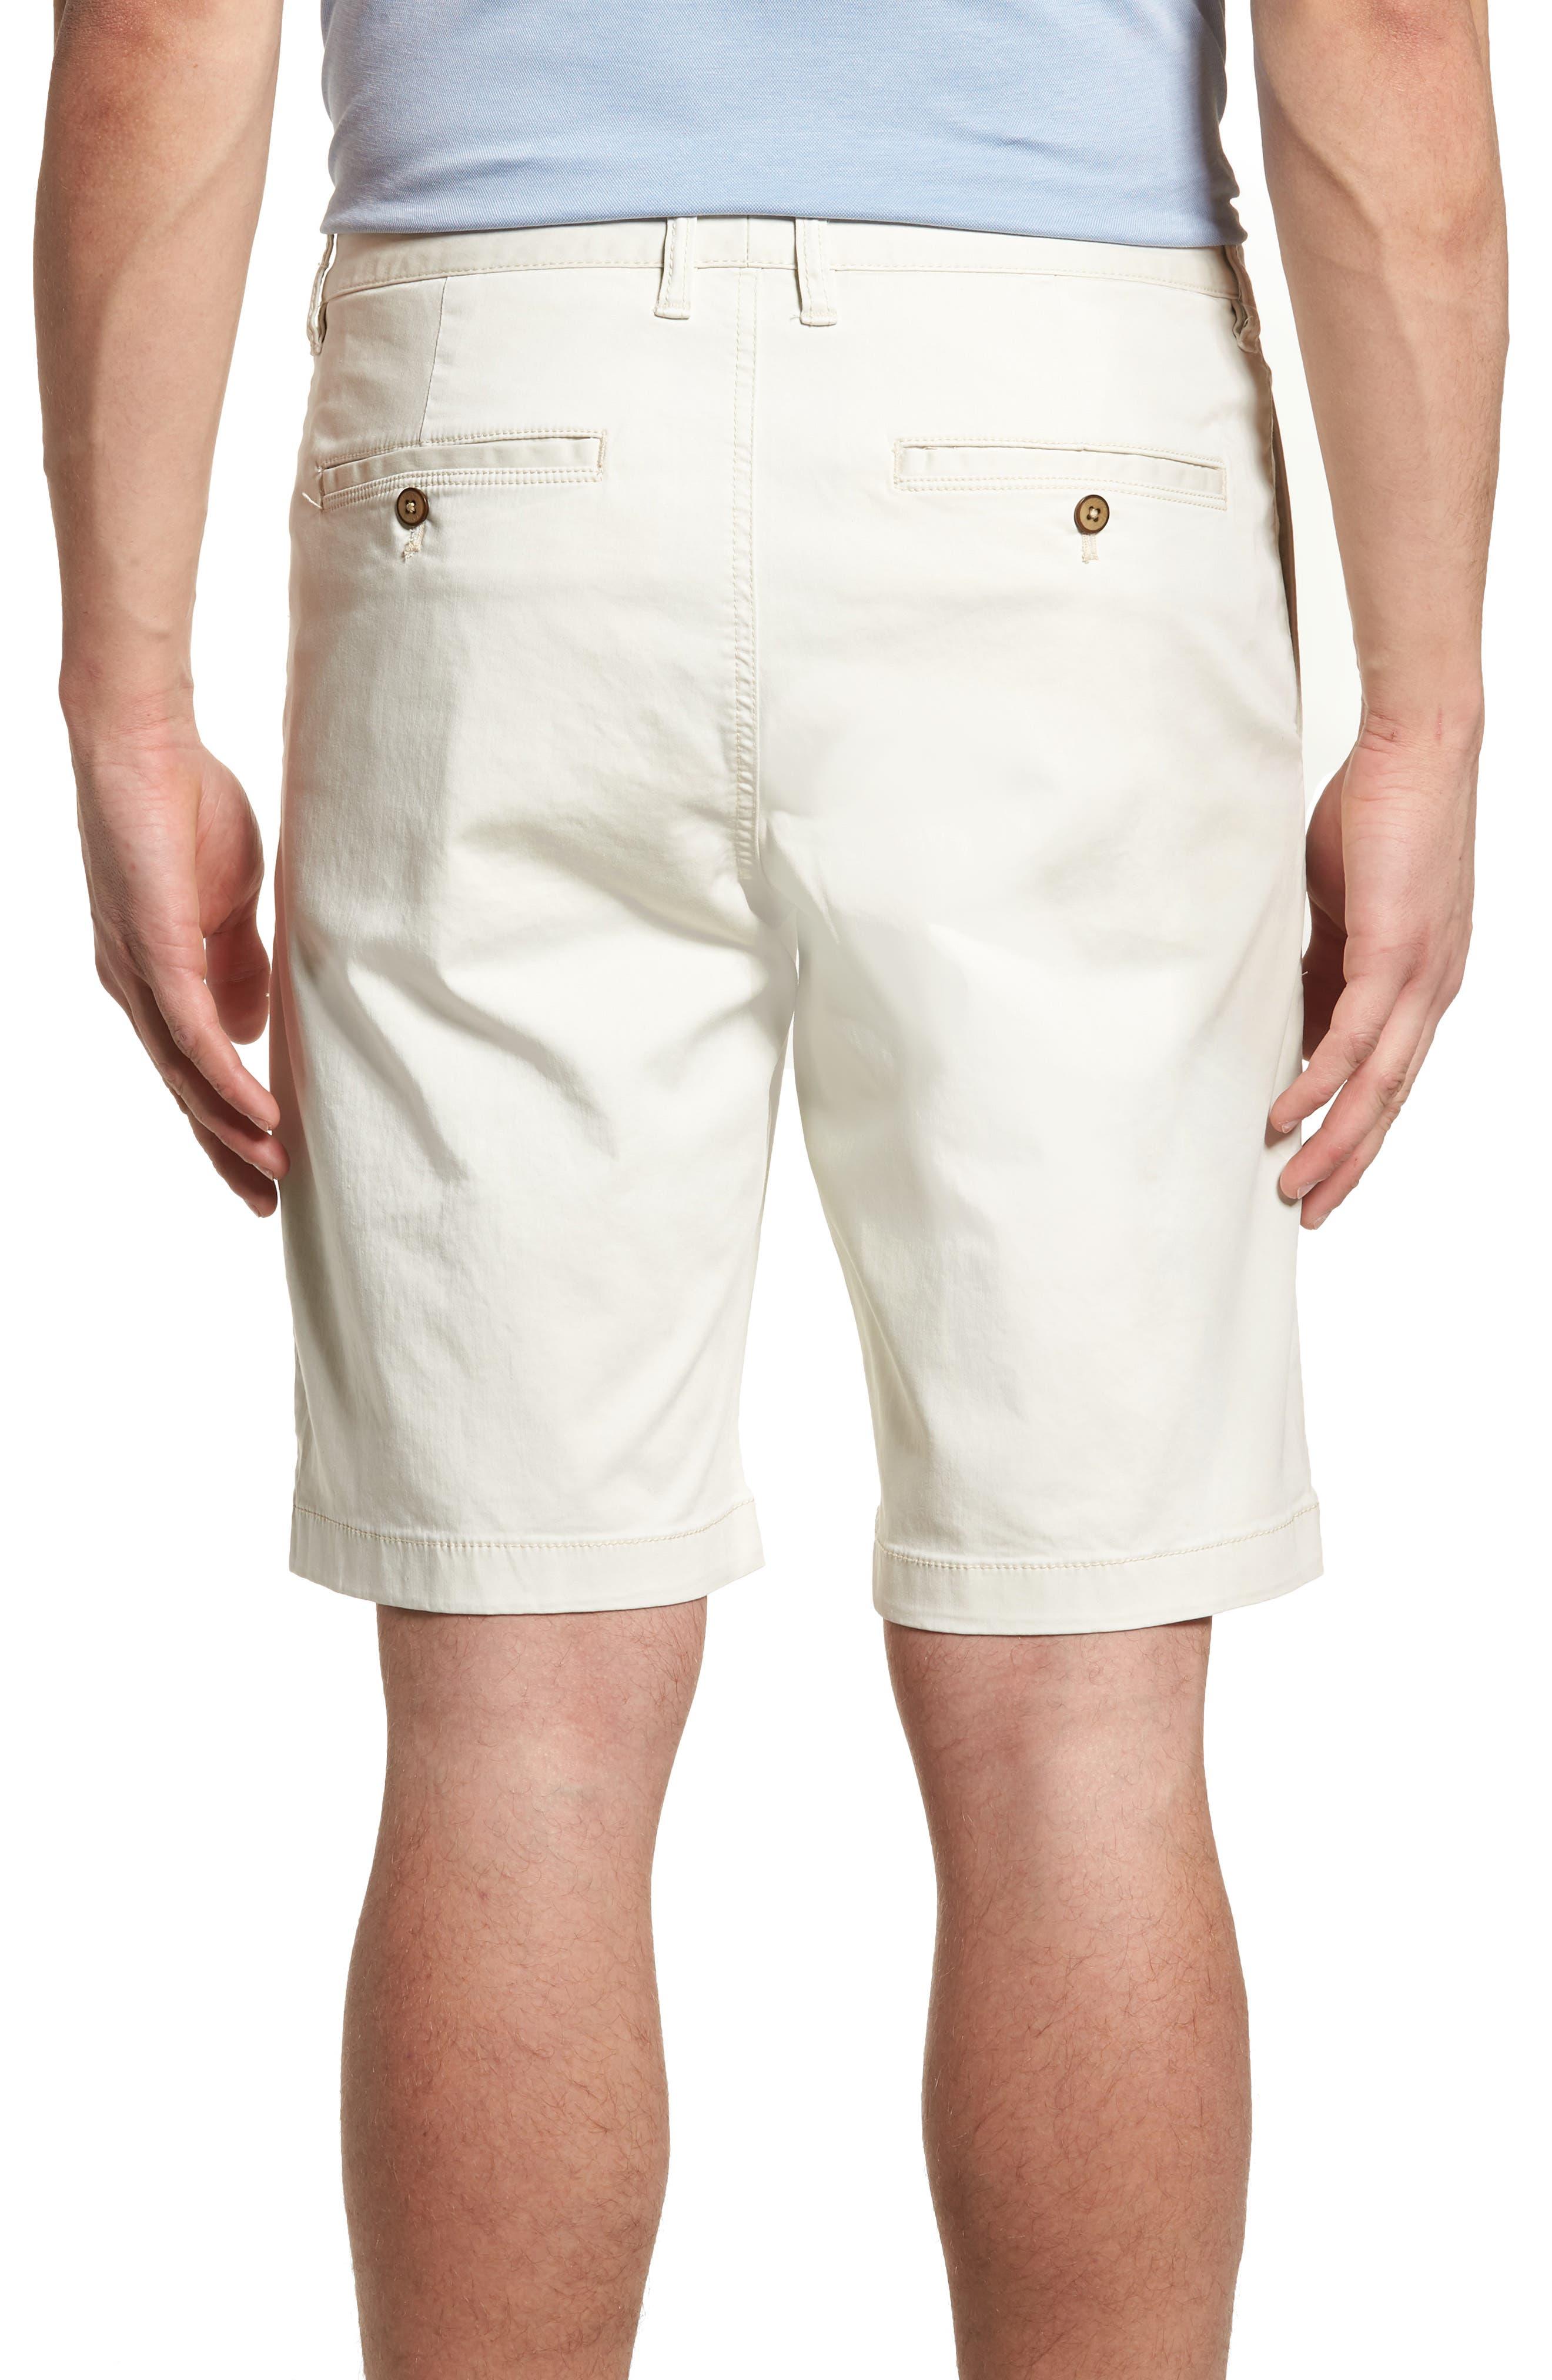 Boracay Chino Shorts,                             Alternate thumbnail 12, color,